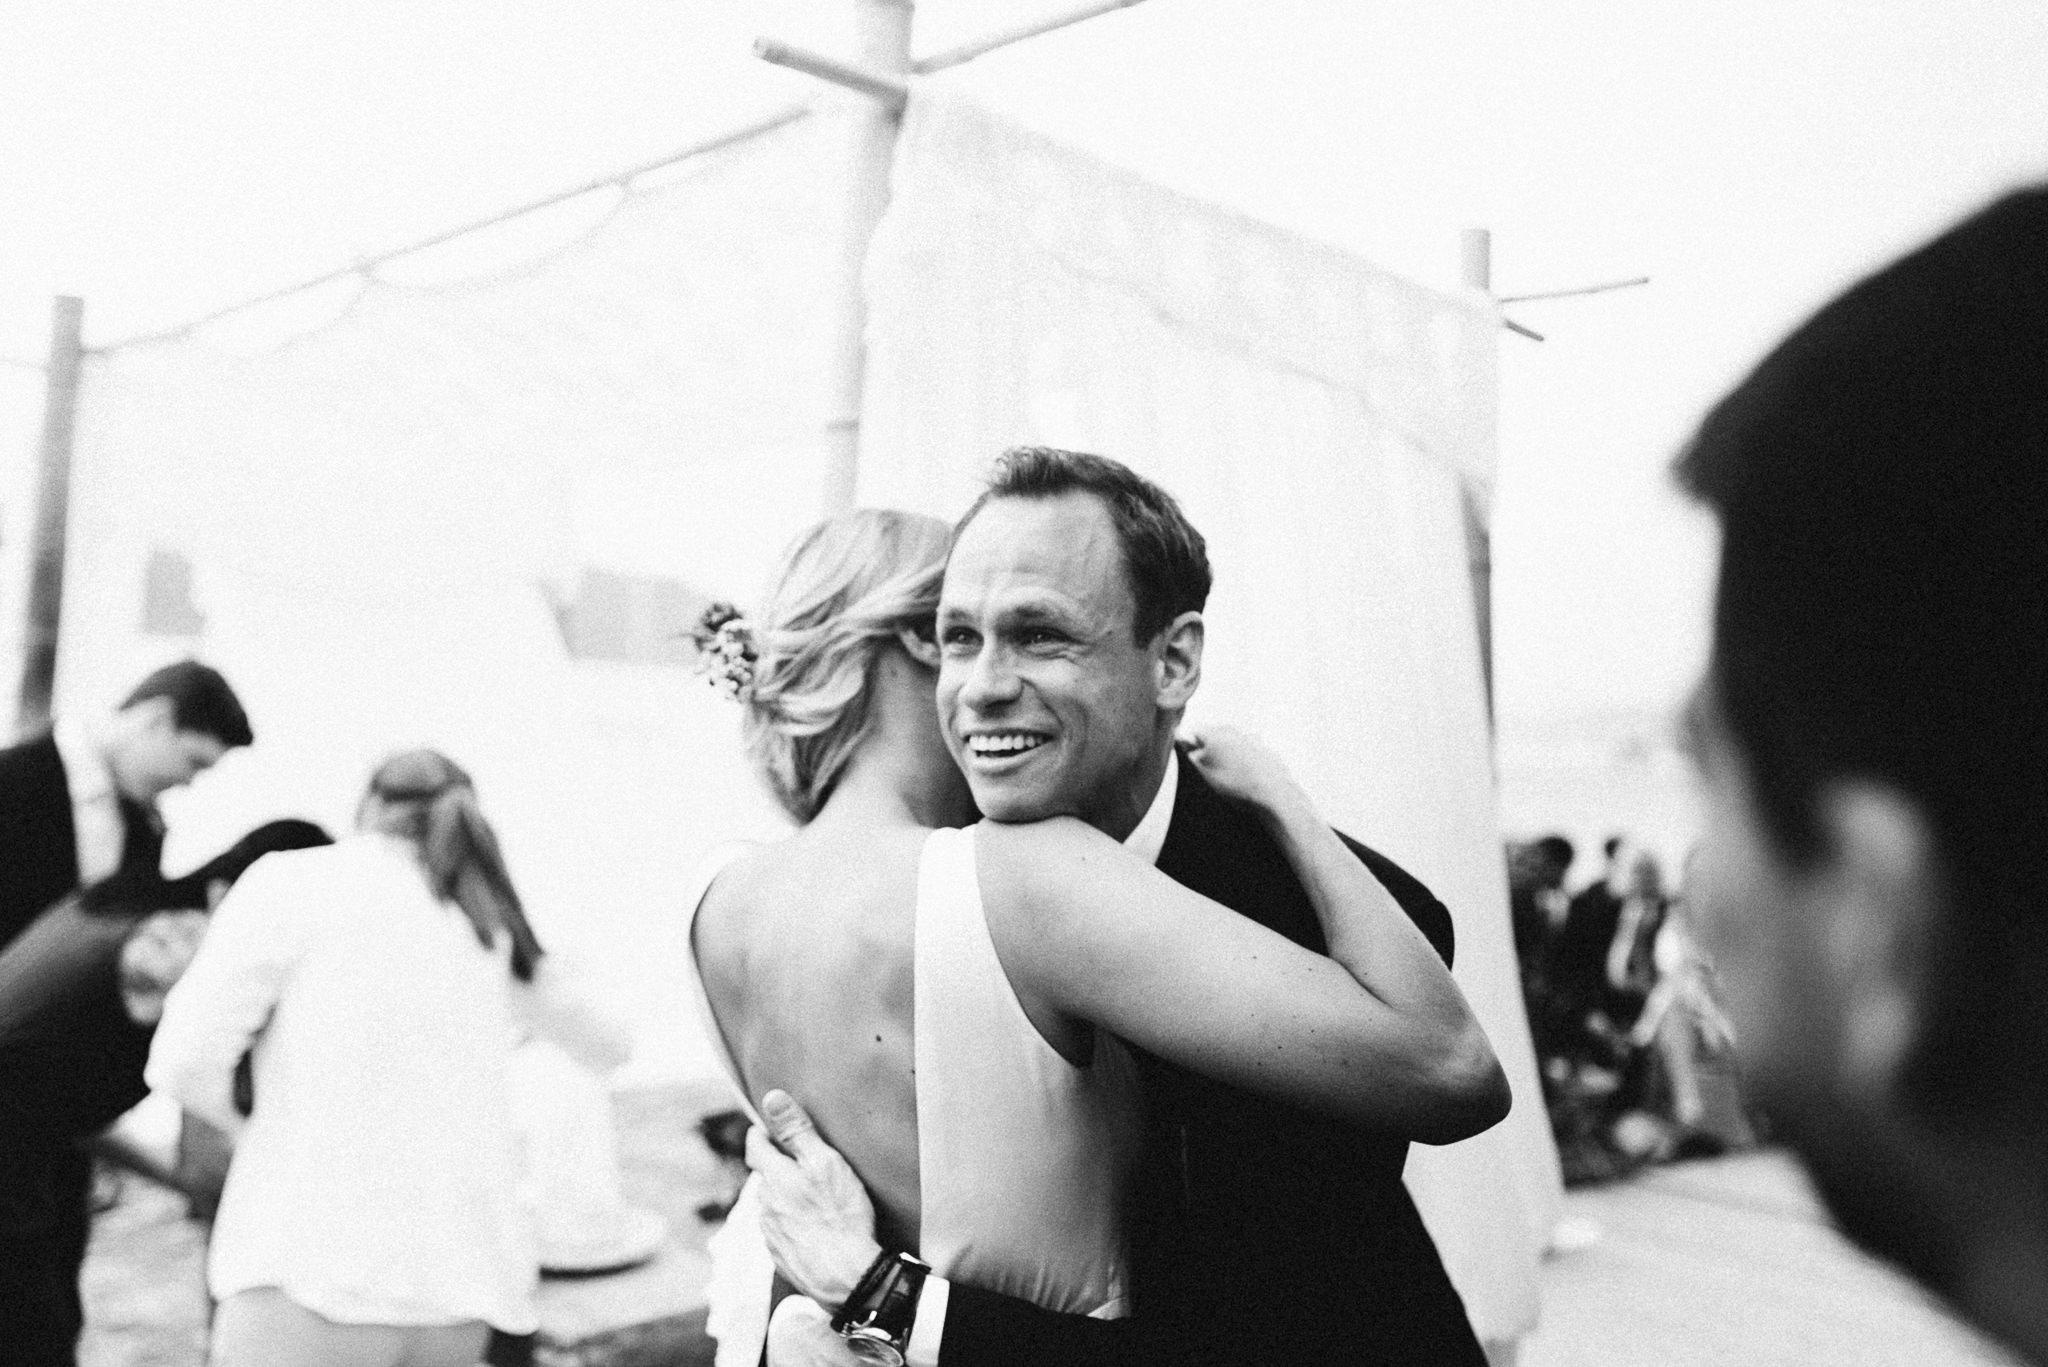 Sydney Wedding Photographer (80 of 182).jpg